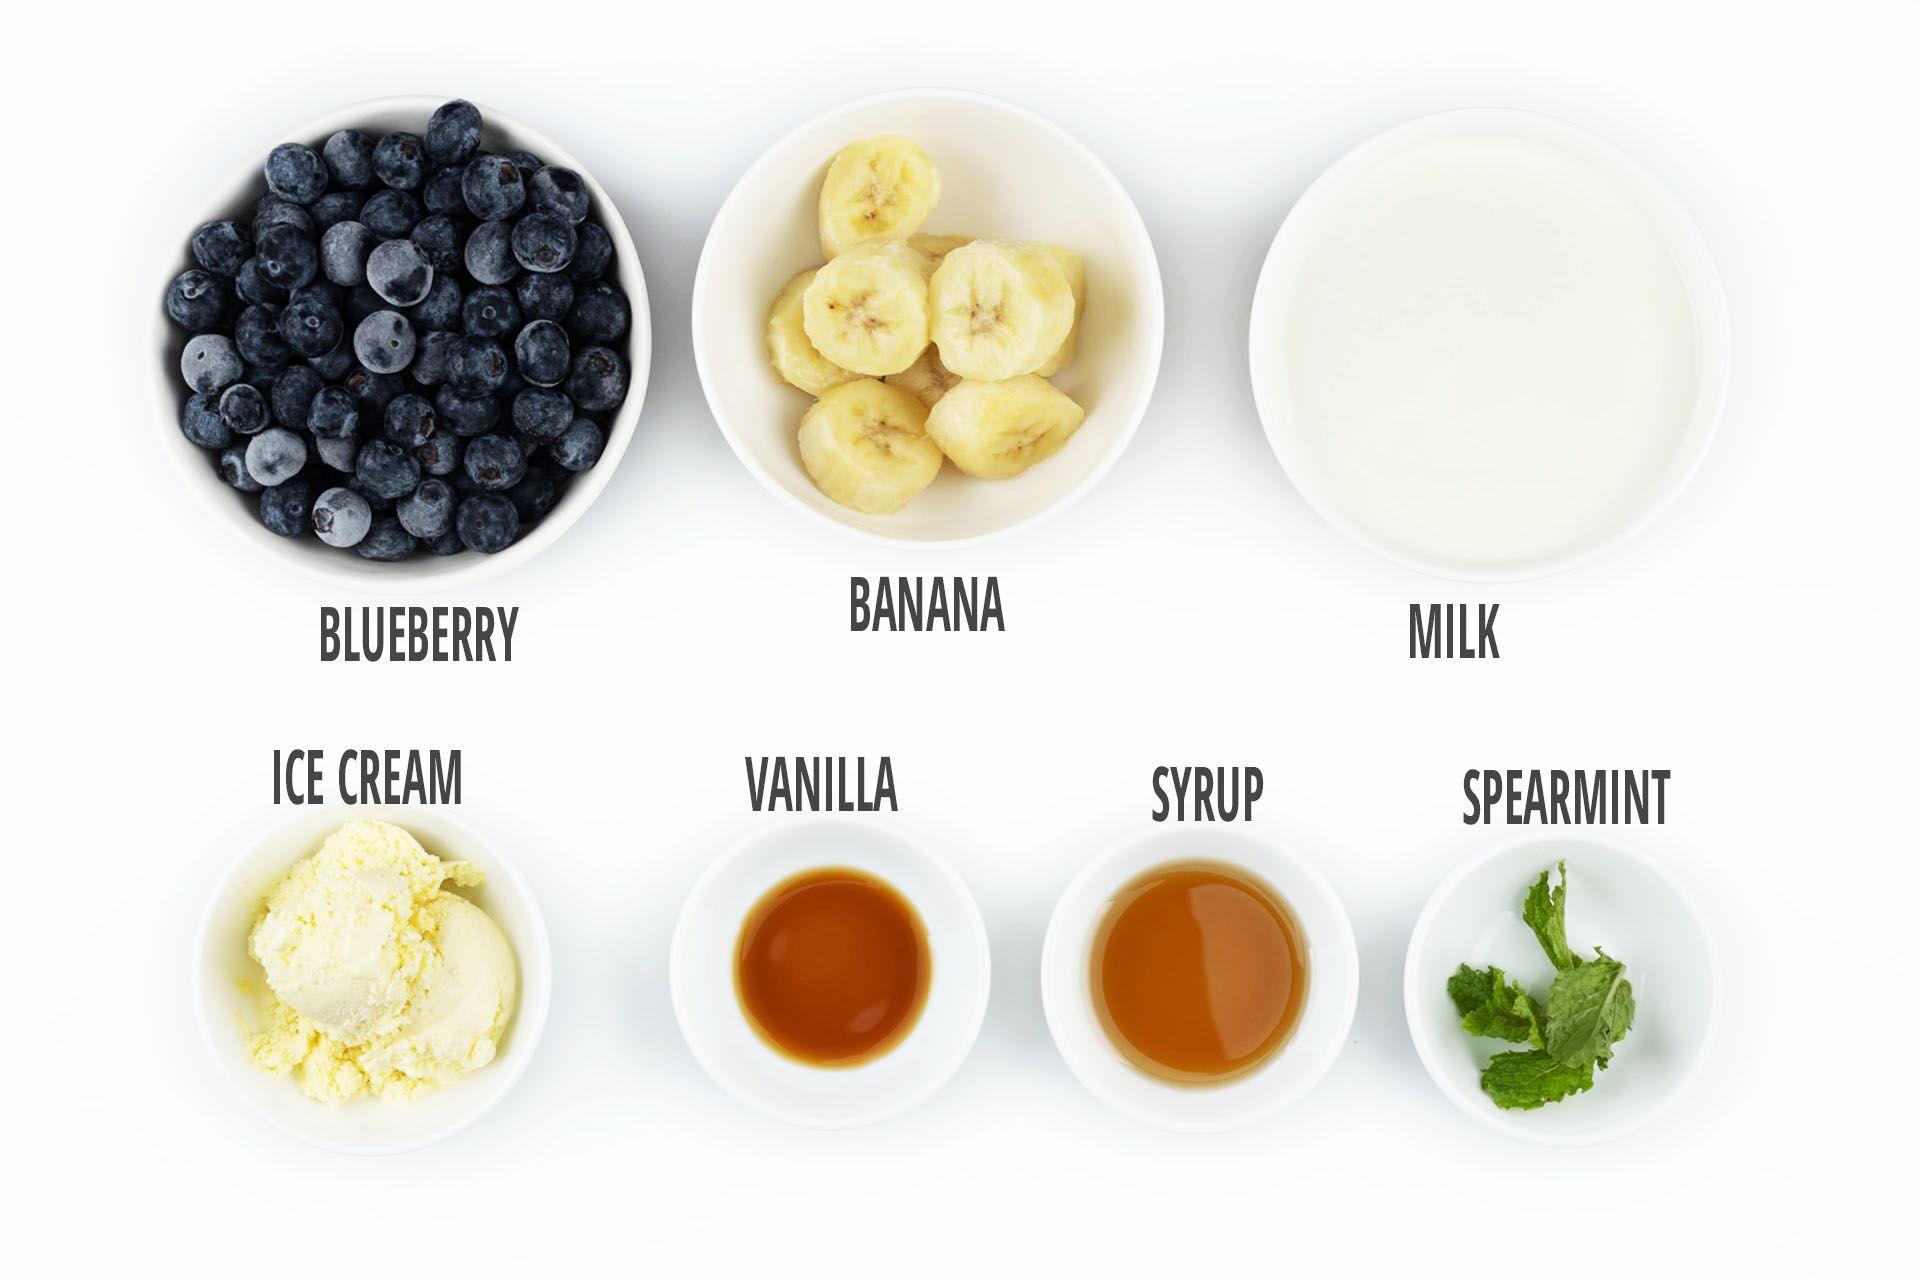 Blueberry Banana Smoothie Ingredient